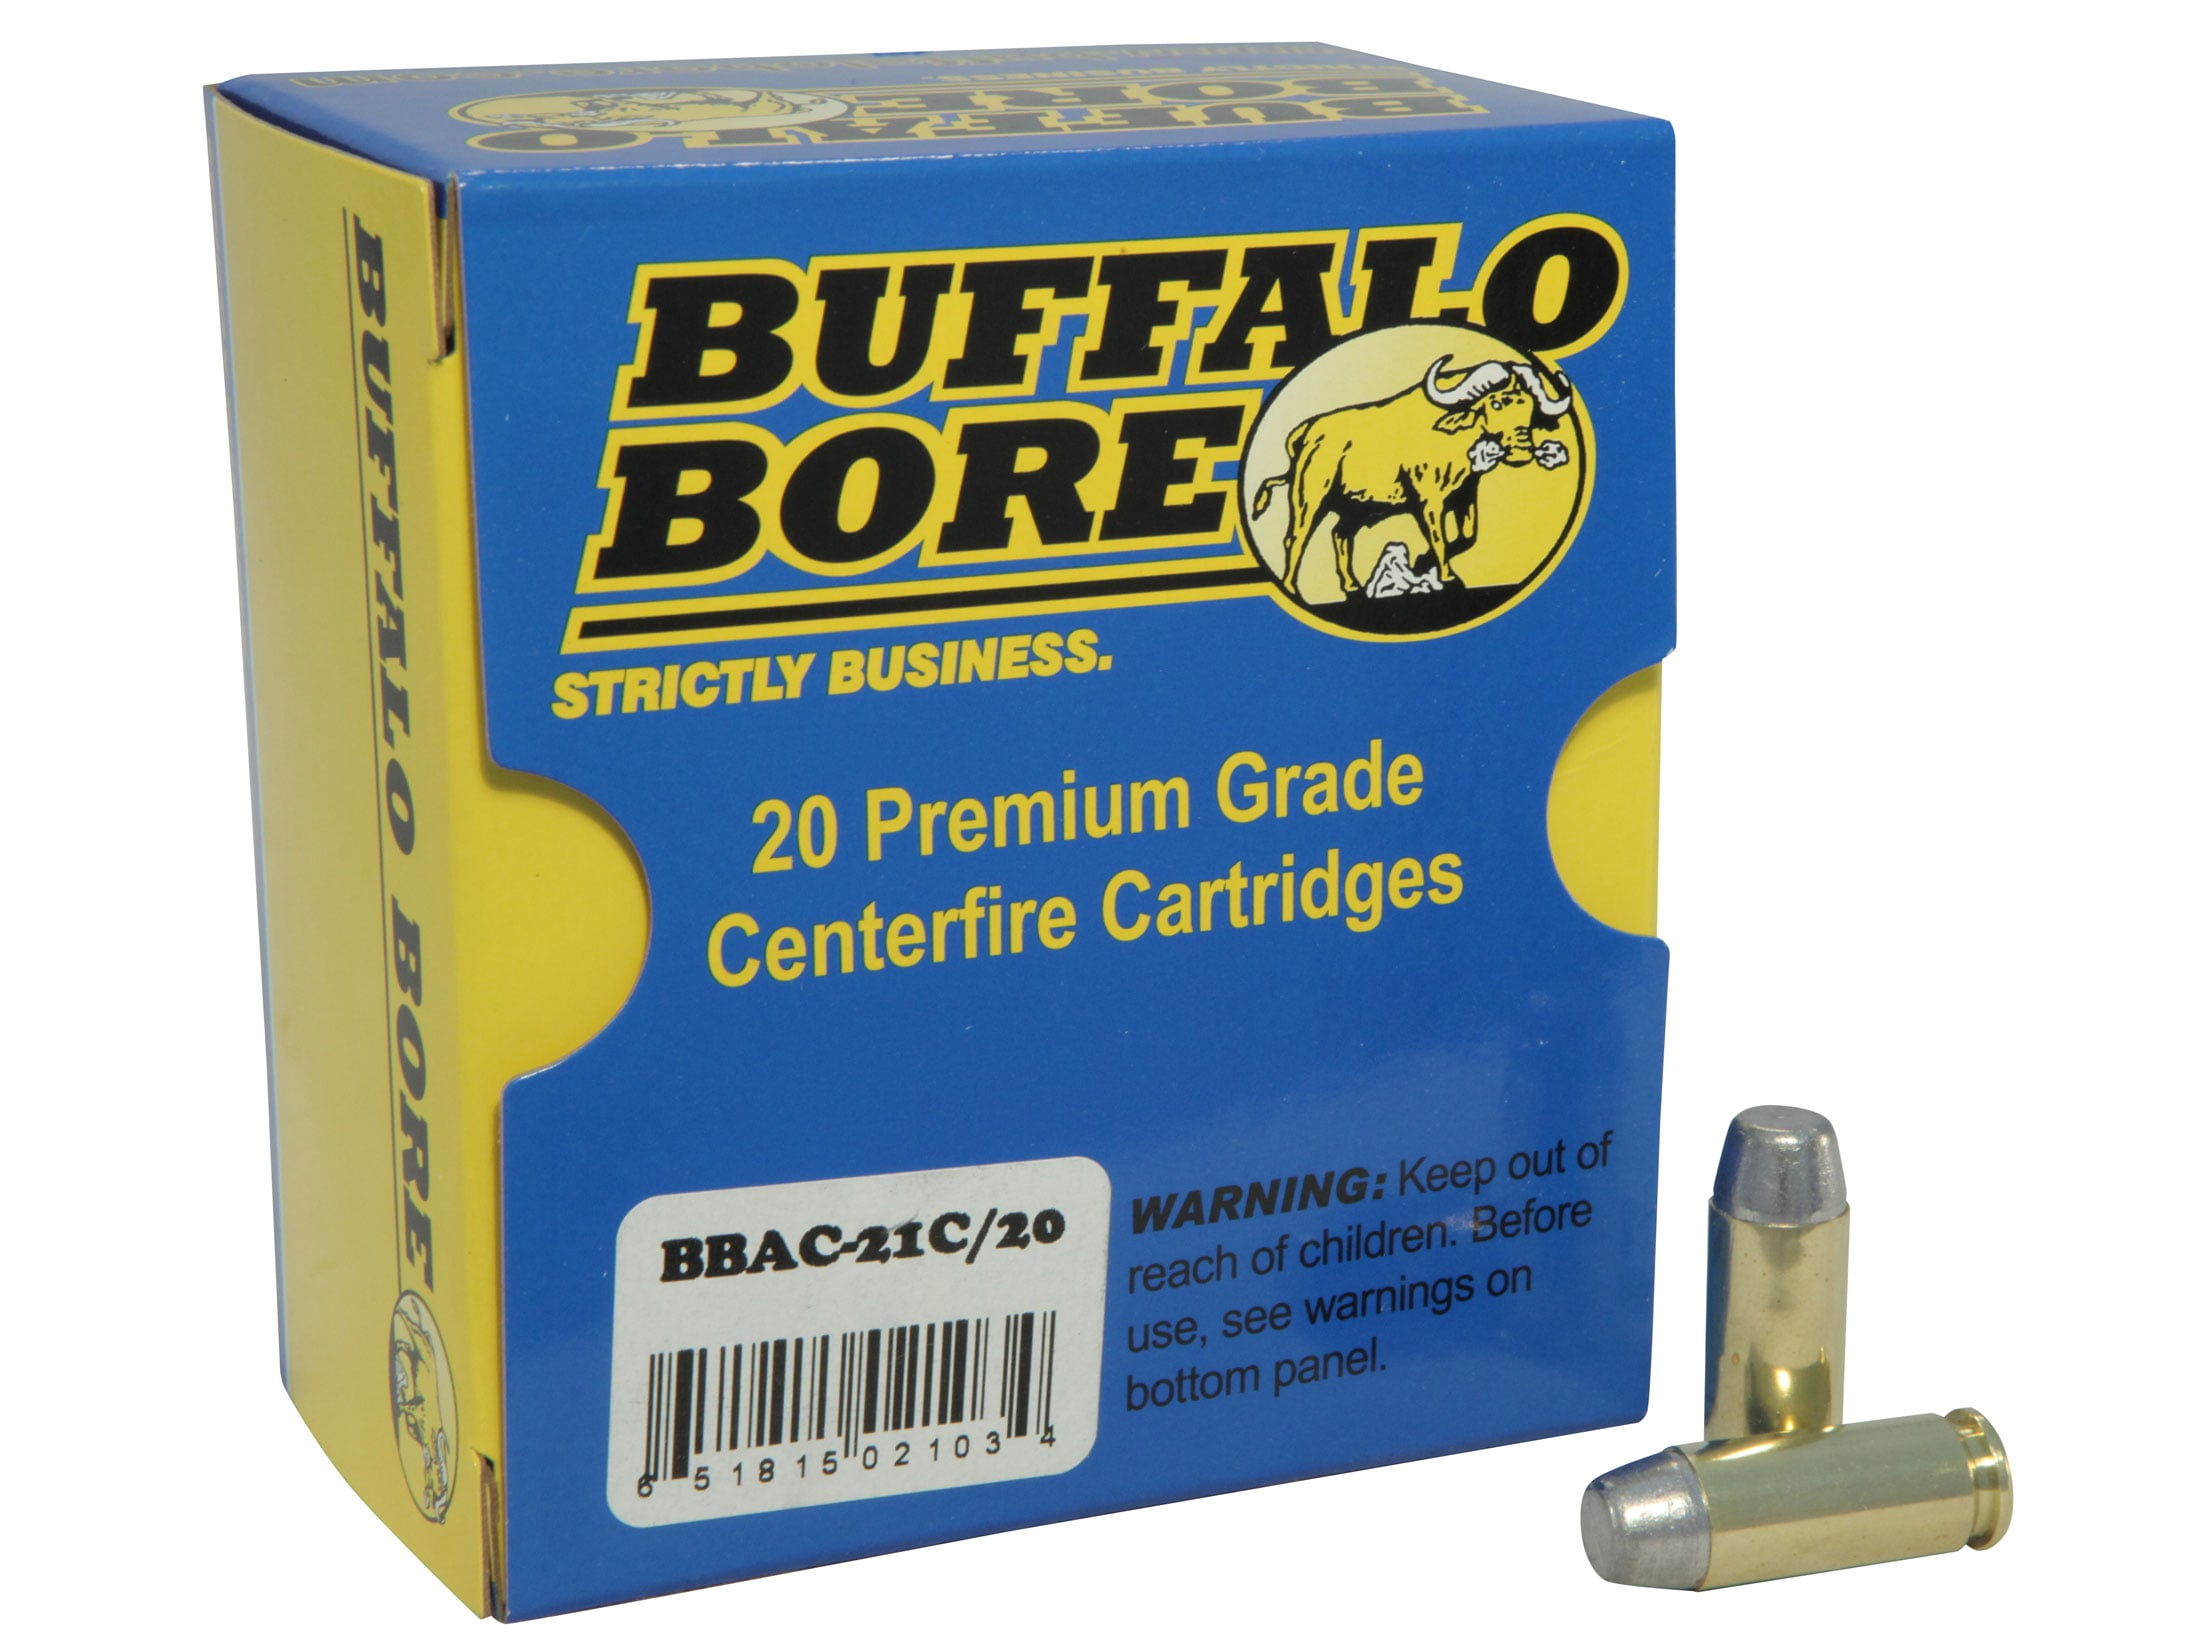 Buffalo Bore Ammo Outdoorsman 10mm Auto 220 Grain Hard Cast Lead Flat